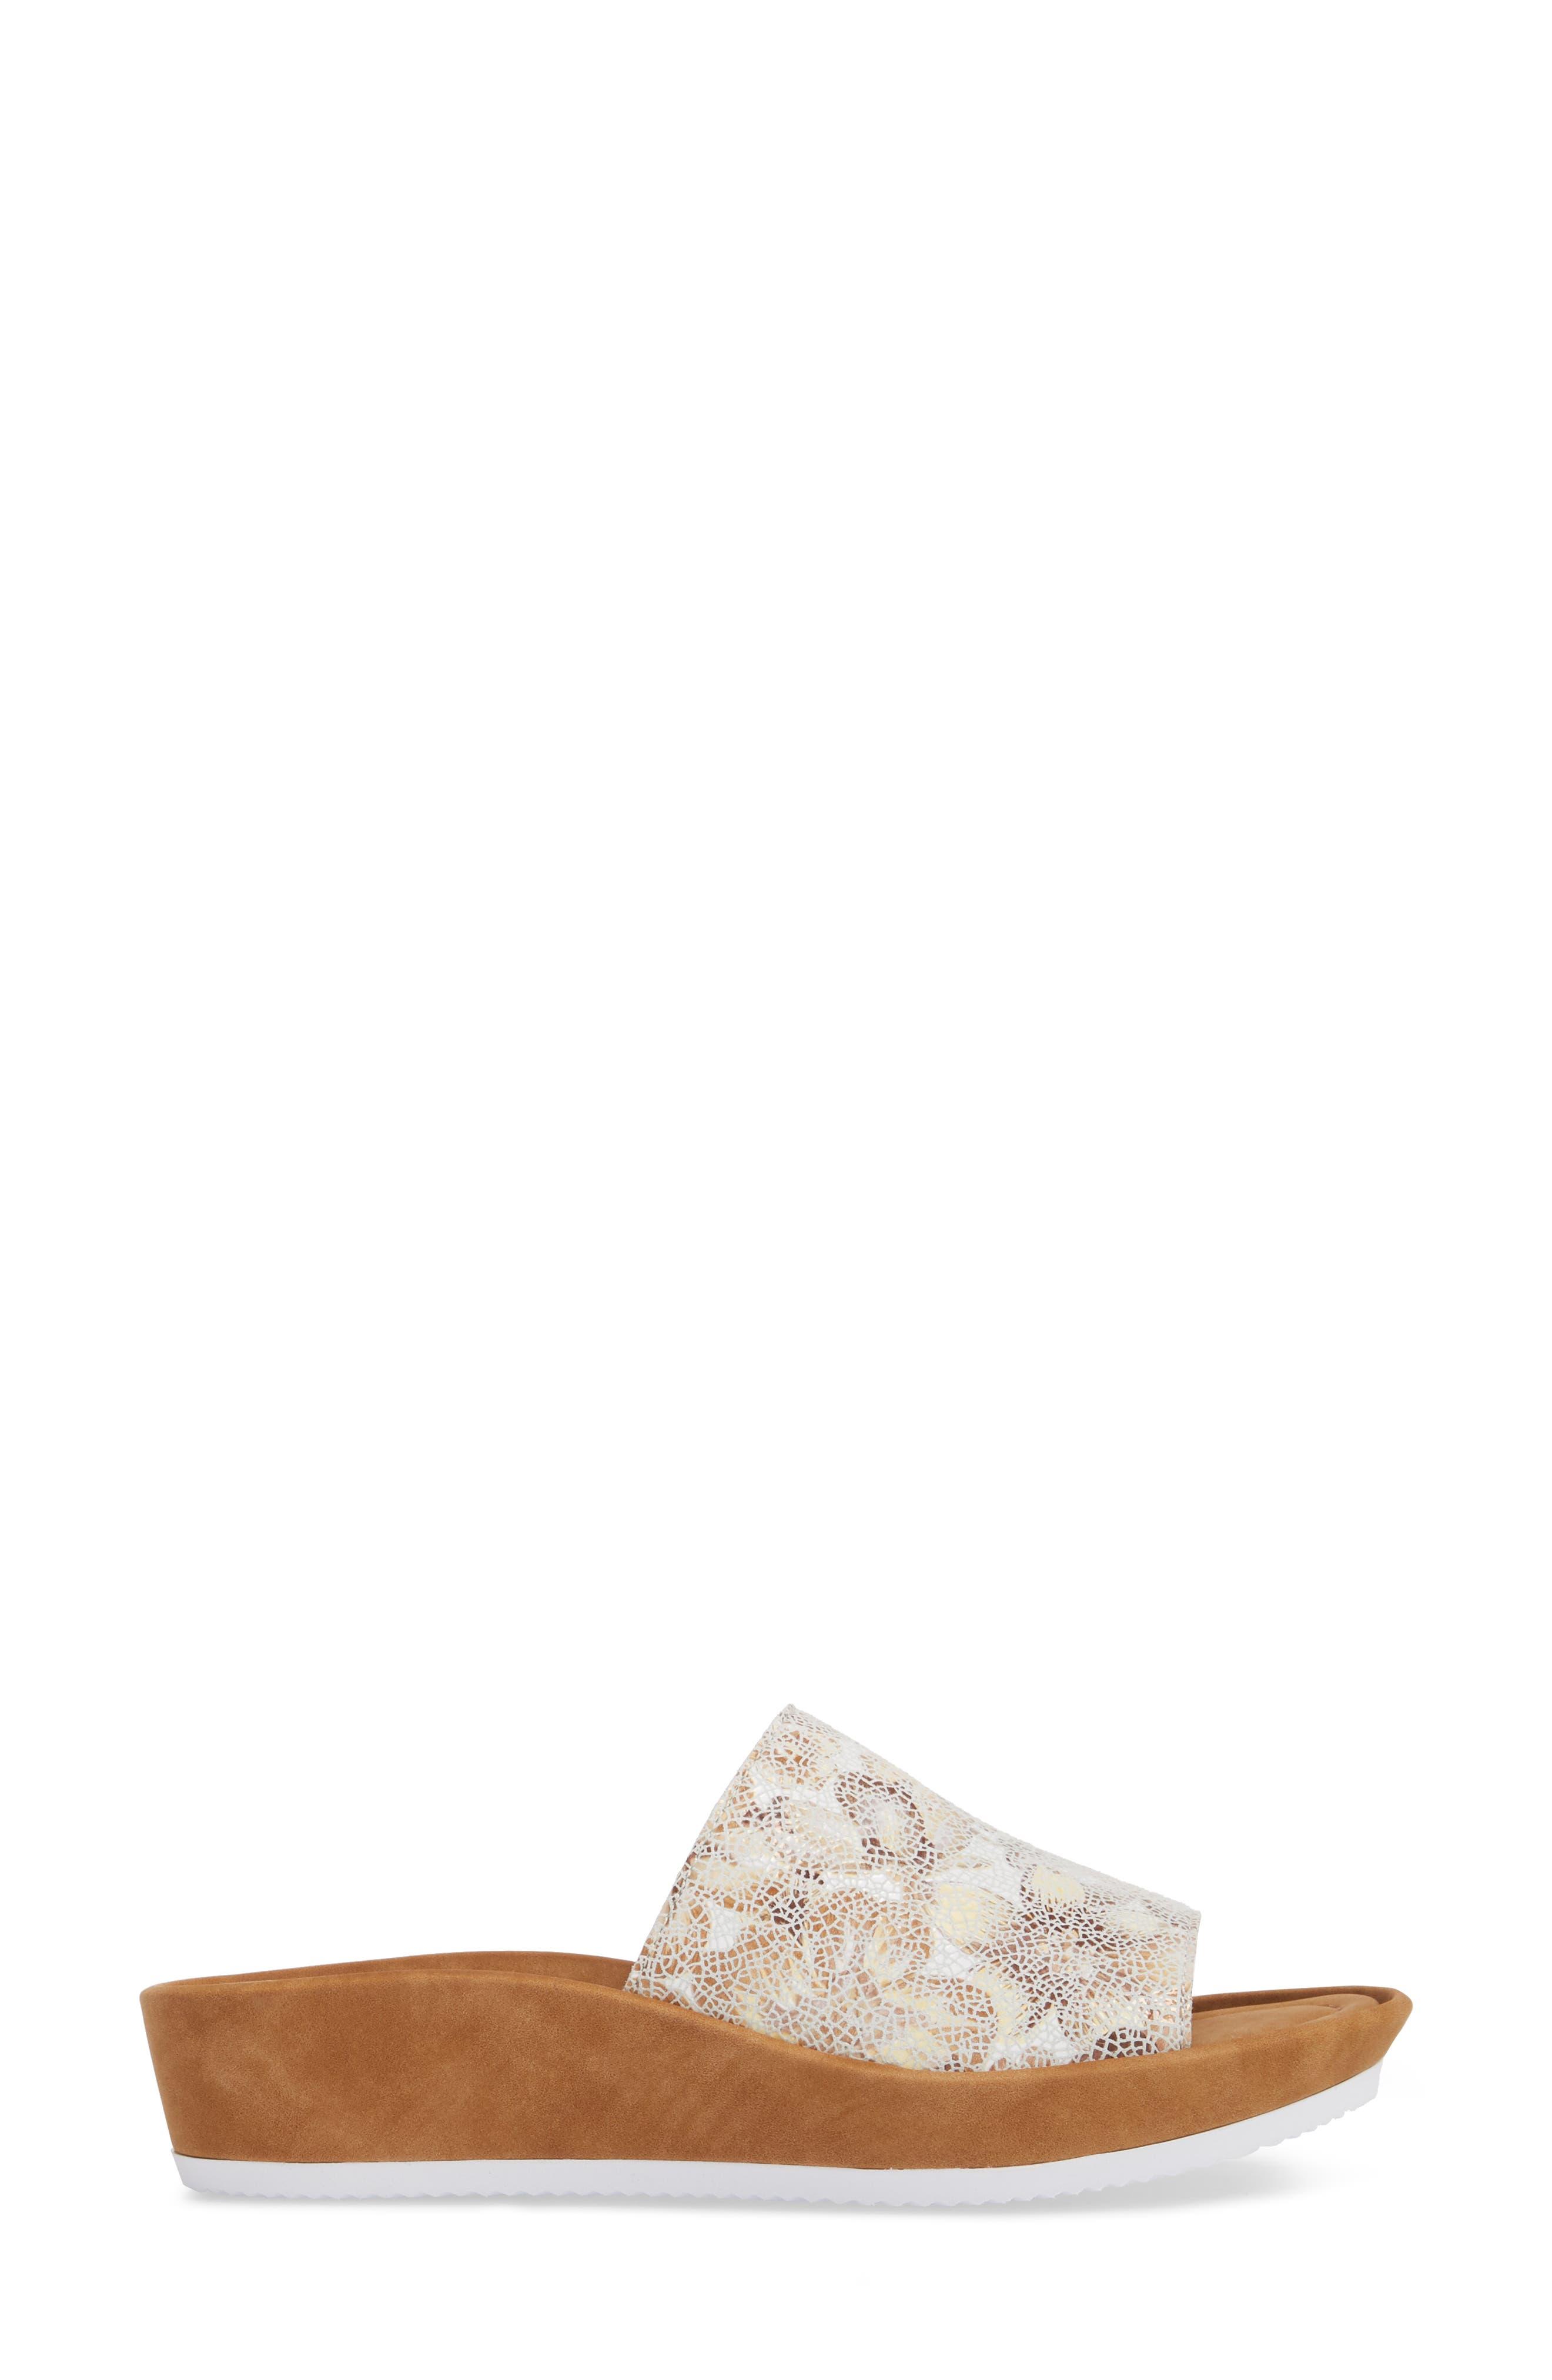 Tania Platform Wedge Slide Sandal,                             Alternate thumbnail 3, color,                             Taupe Leather